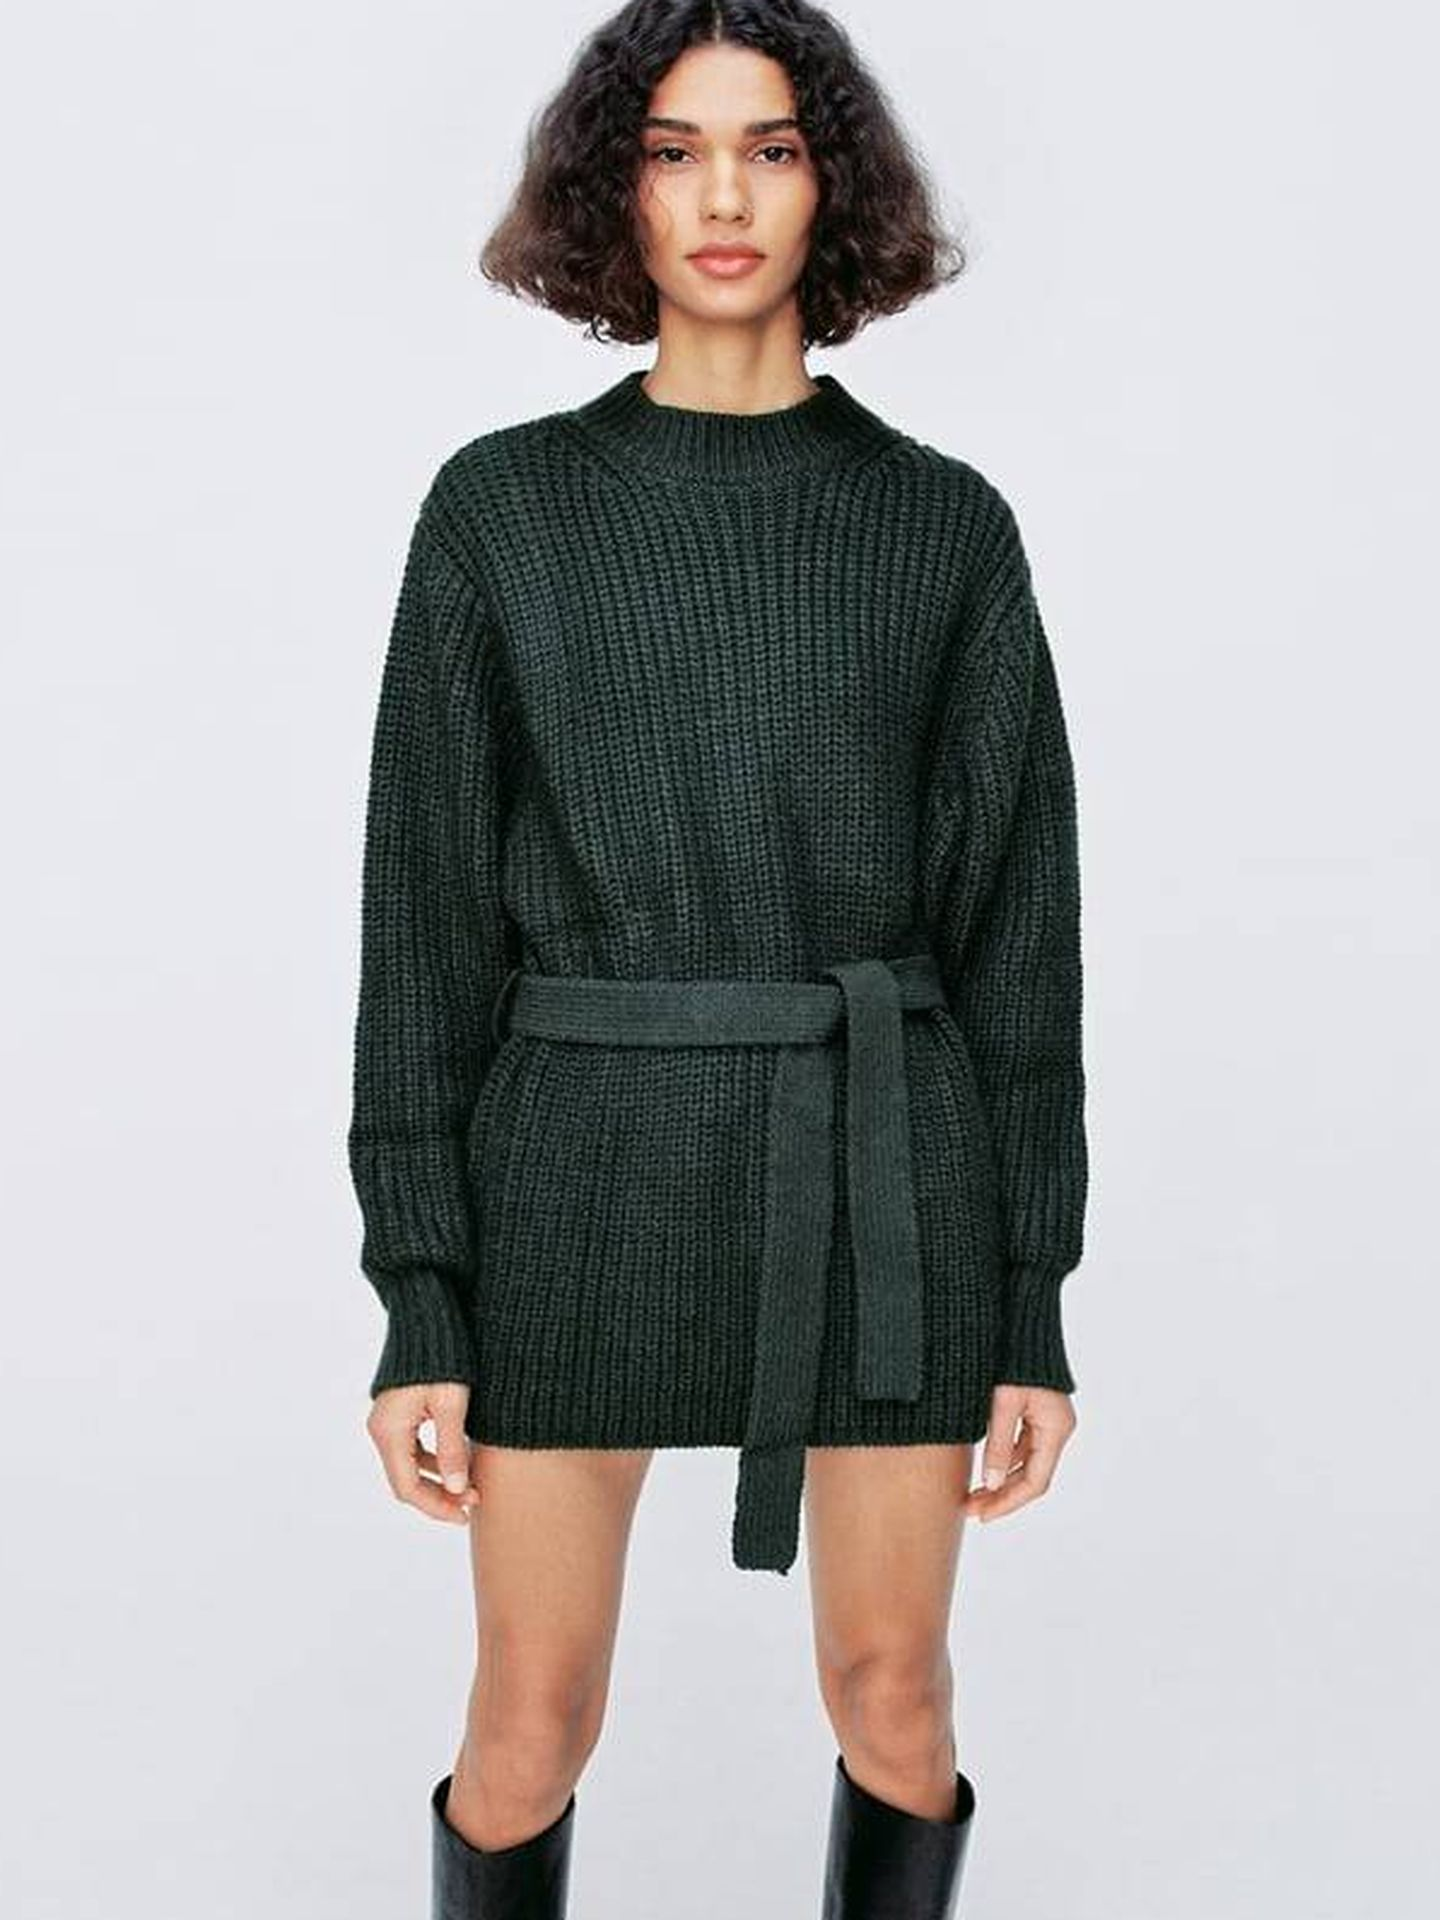 Jersey oversize de Zara. (Cortesía)